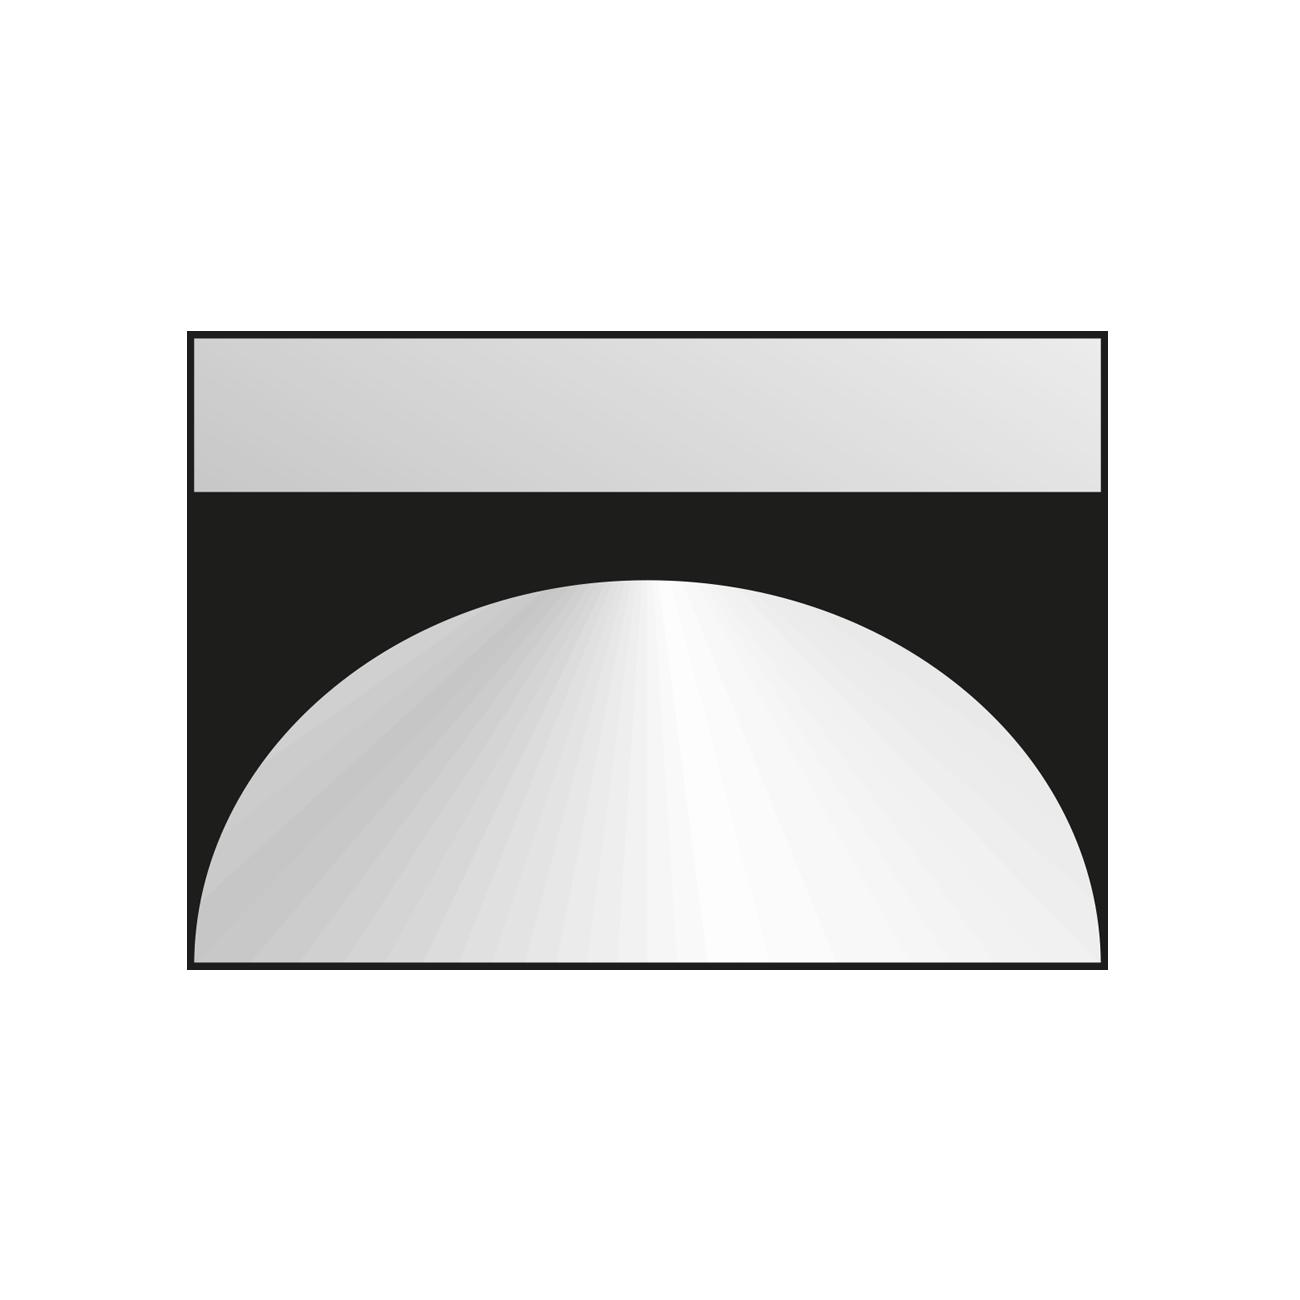 Pana Circulara 6888 Otel Olc45-5x 9.0-22